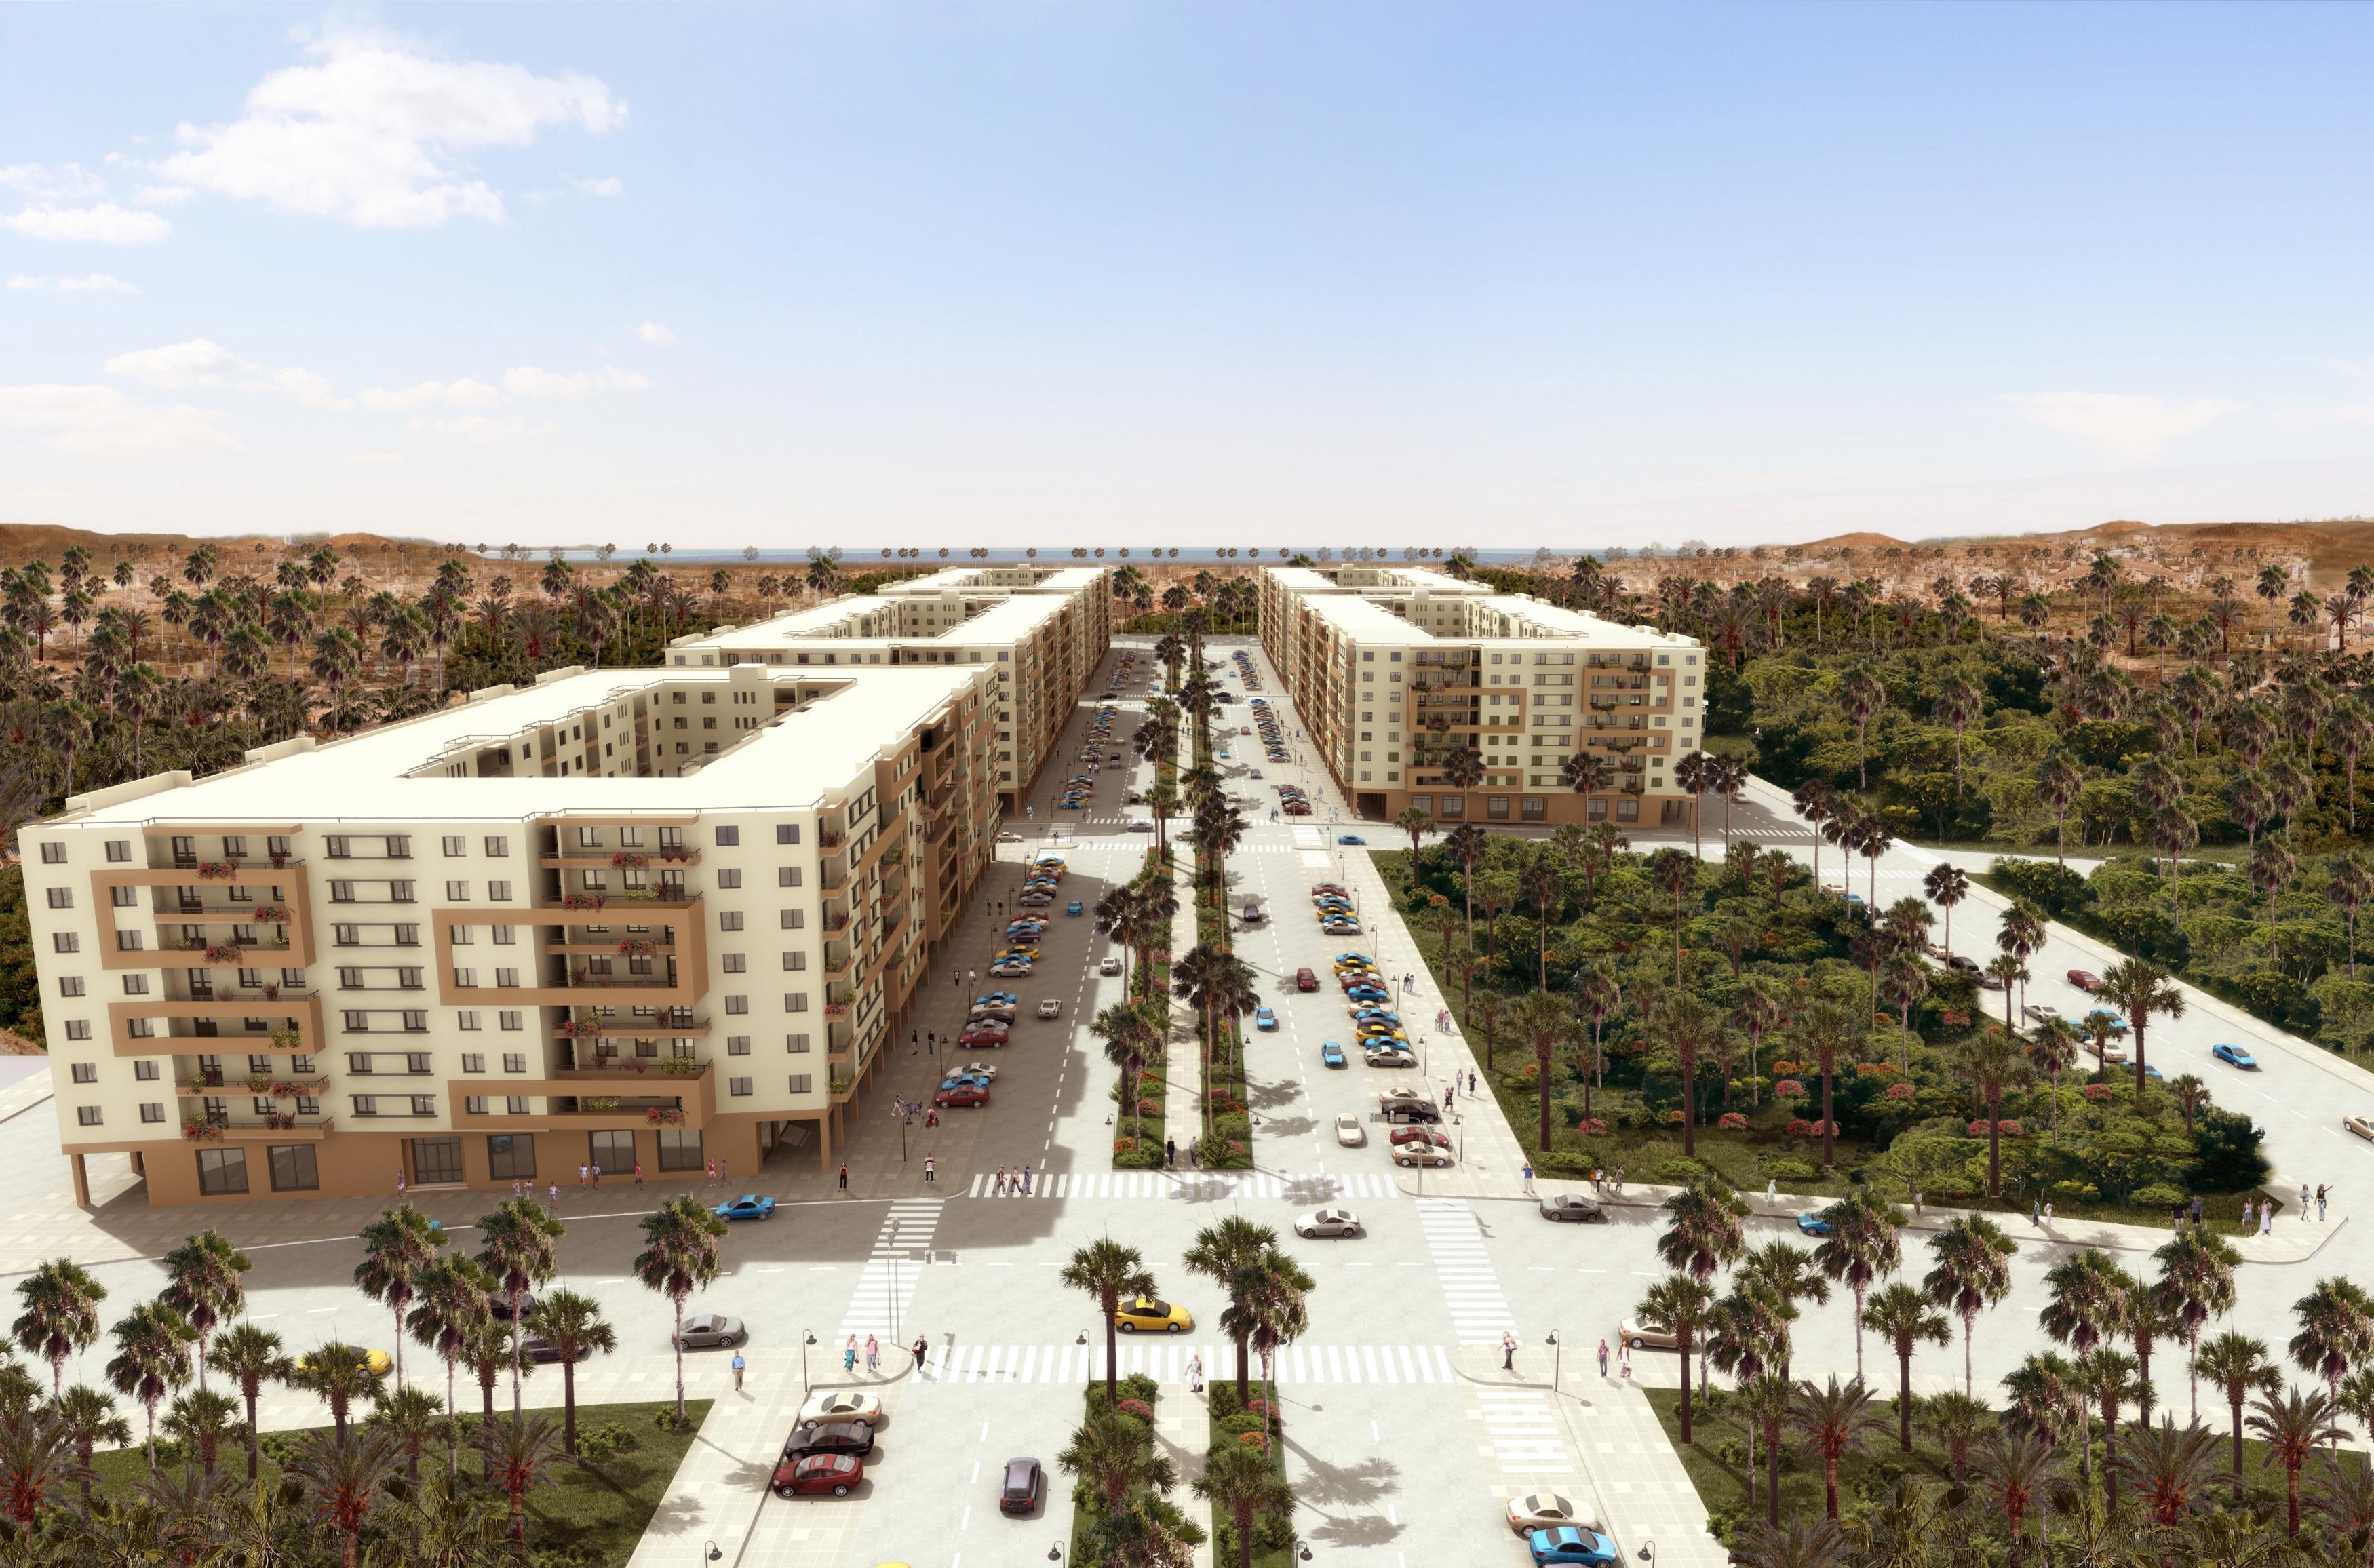 RESIDENTIAL - IBN Battuta –Tangier, Morocco